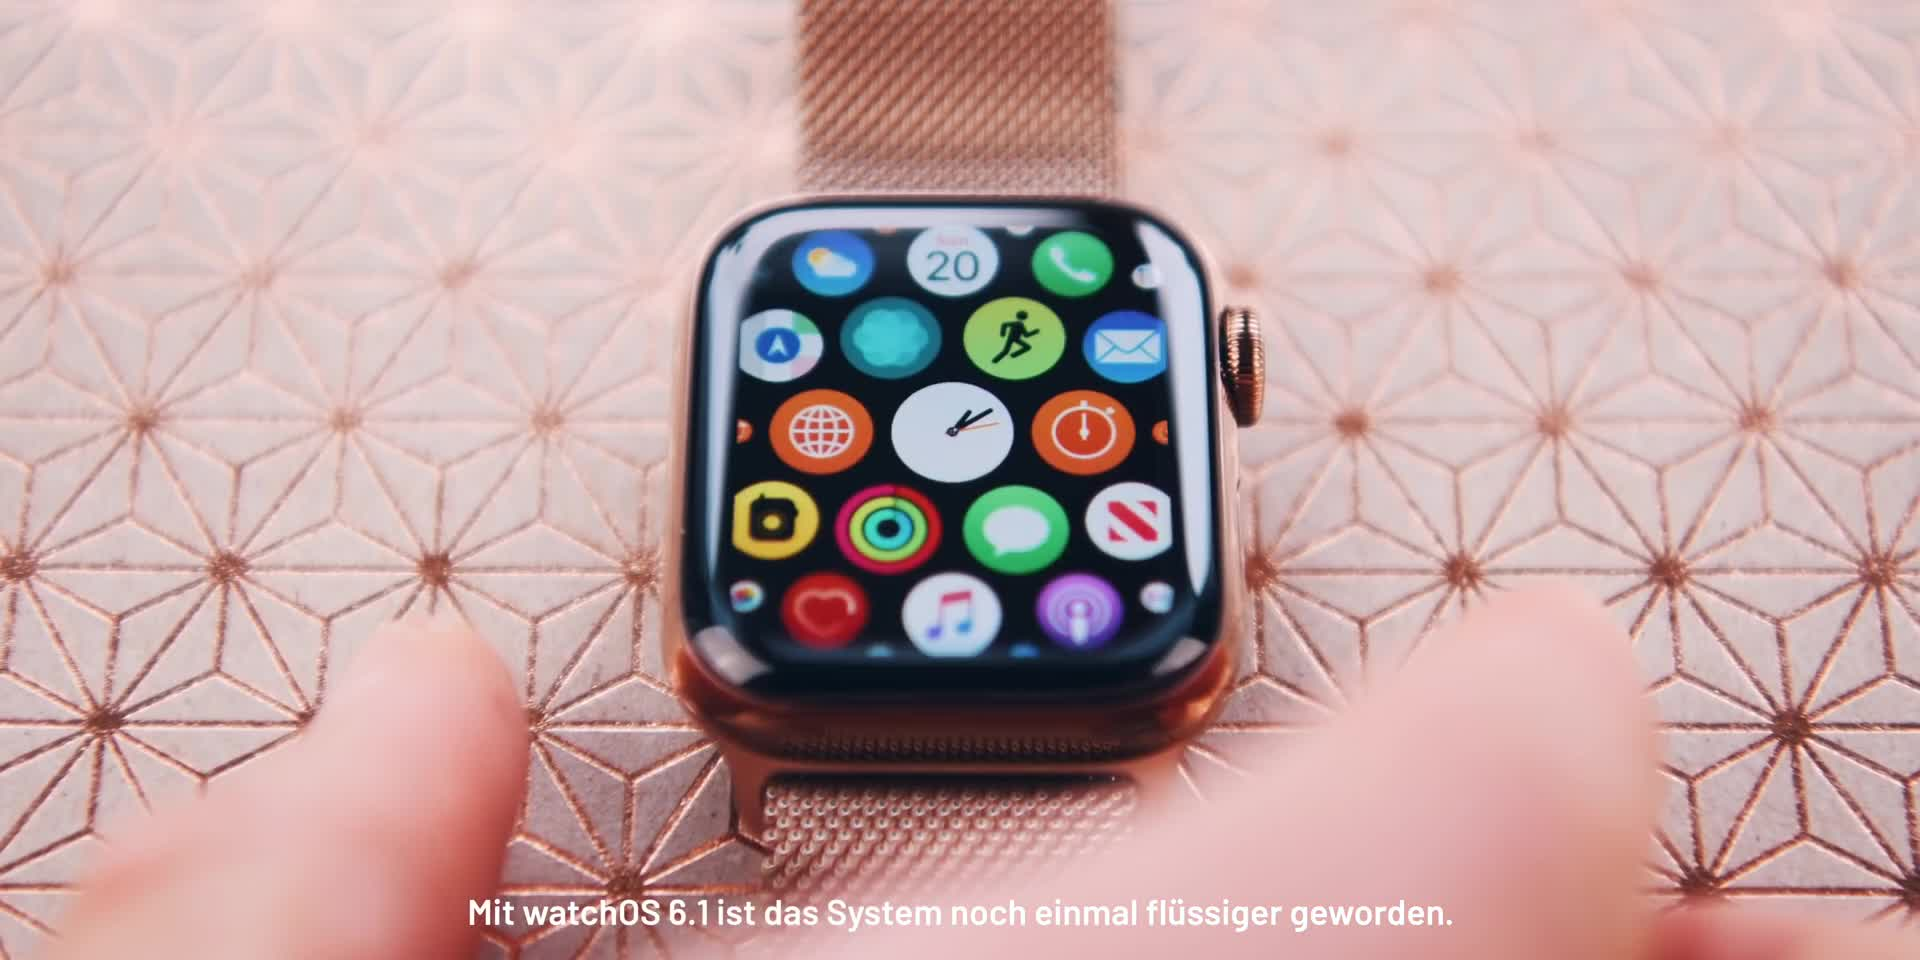 Apple, Test, smartwatch, Uhr, Wearables, Apple Watch, Armbanduhr, Jonas Kaniuth, TechnikFreundYT, Apple Watch Series 5